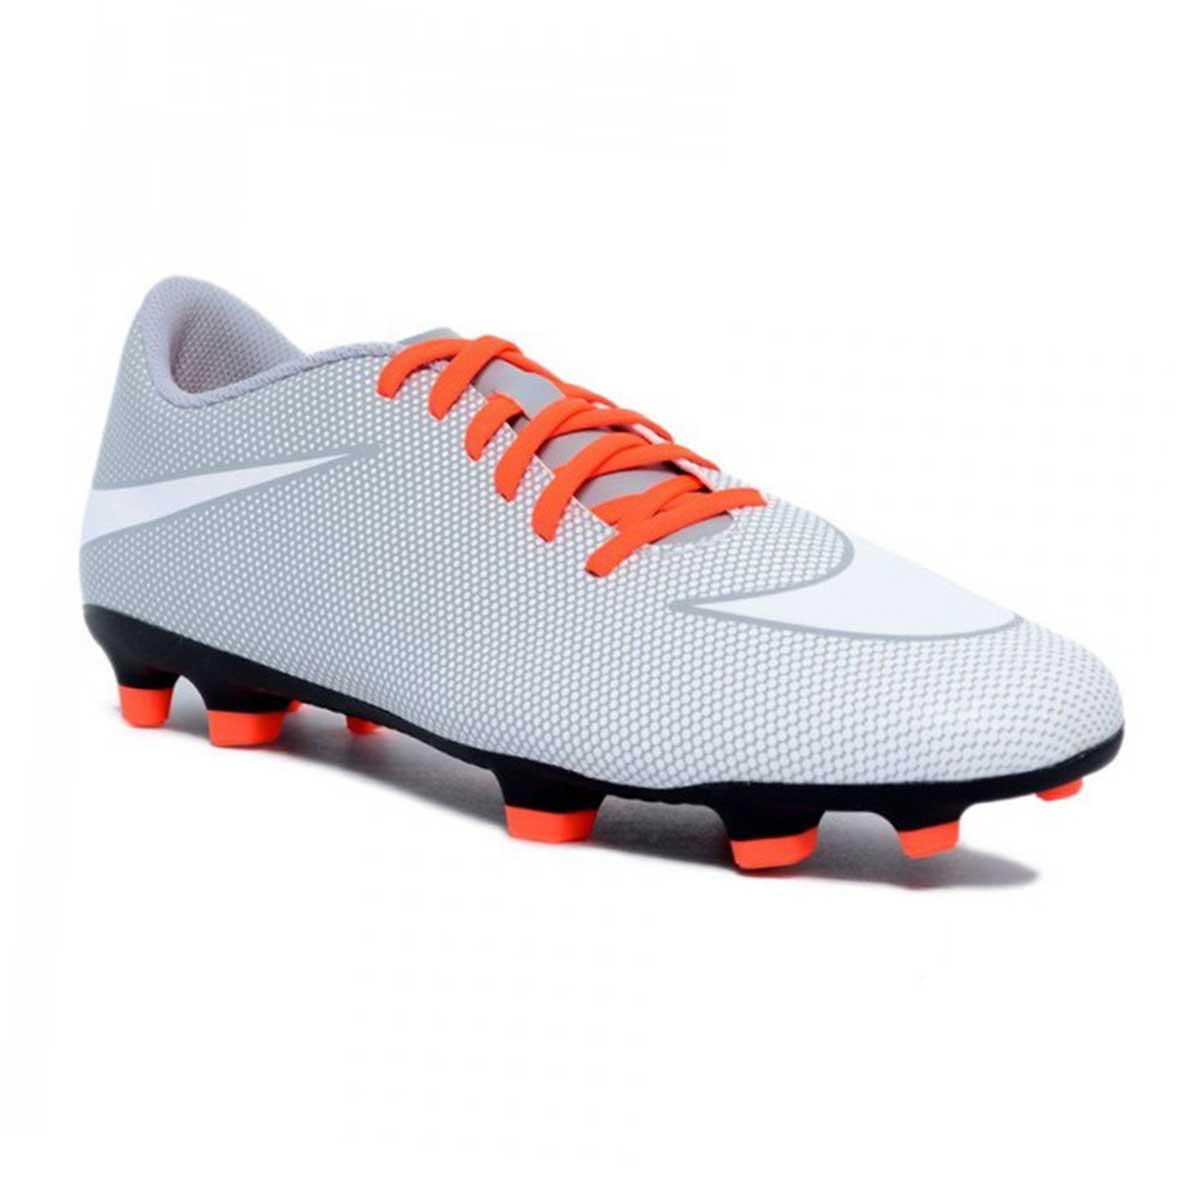 detailed look f6b3a 08b91 Buy Nike Bravata II FG Football Shoes (White Wolf Grey) Online